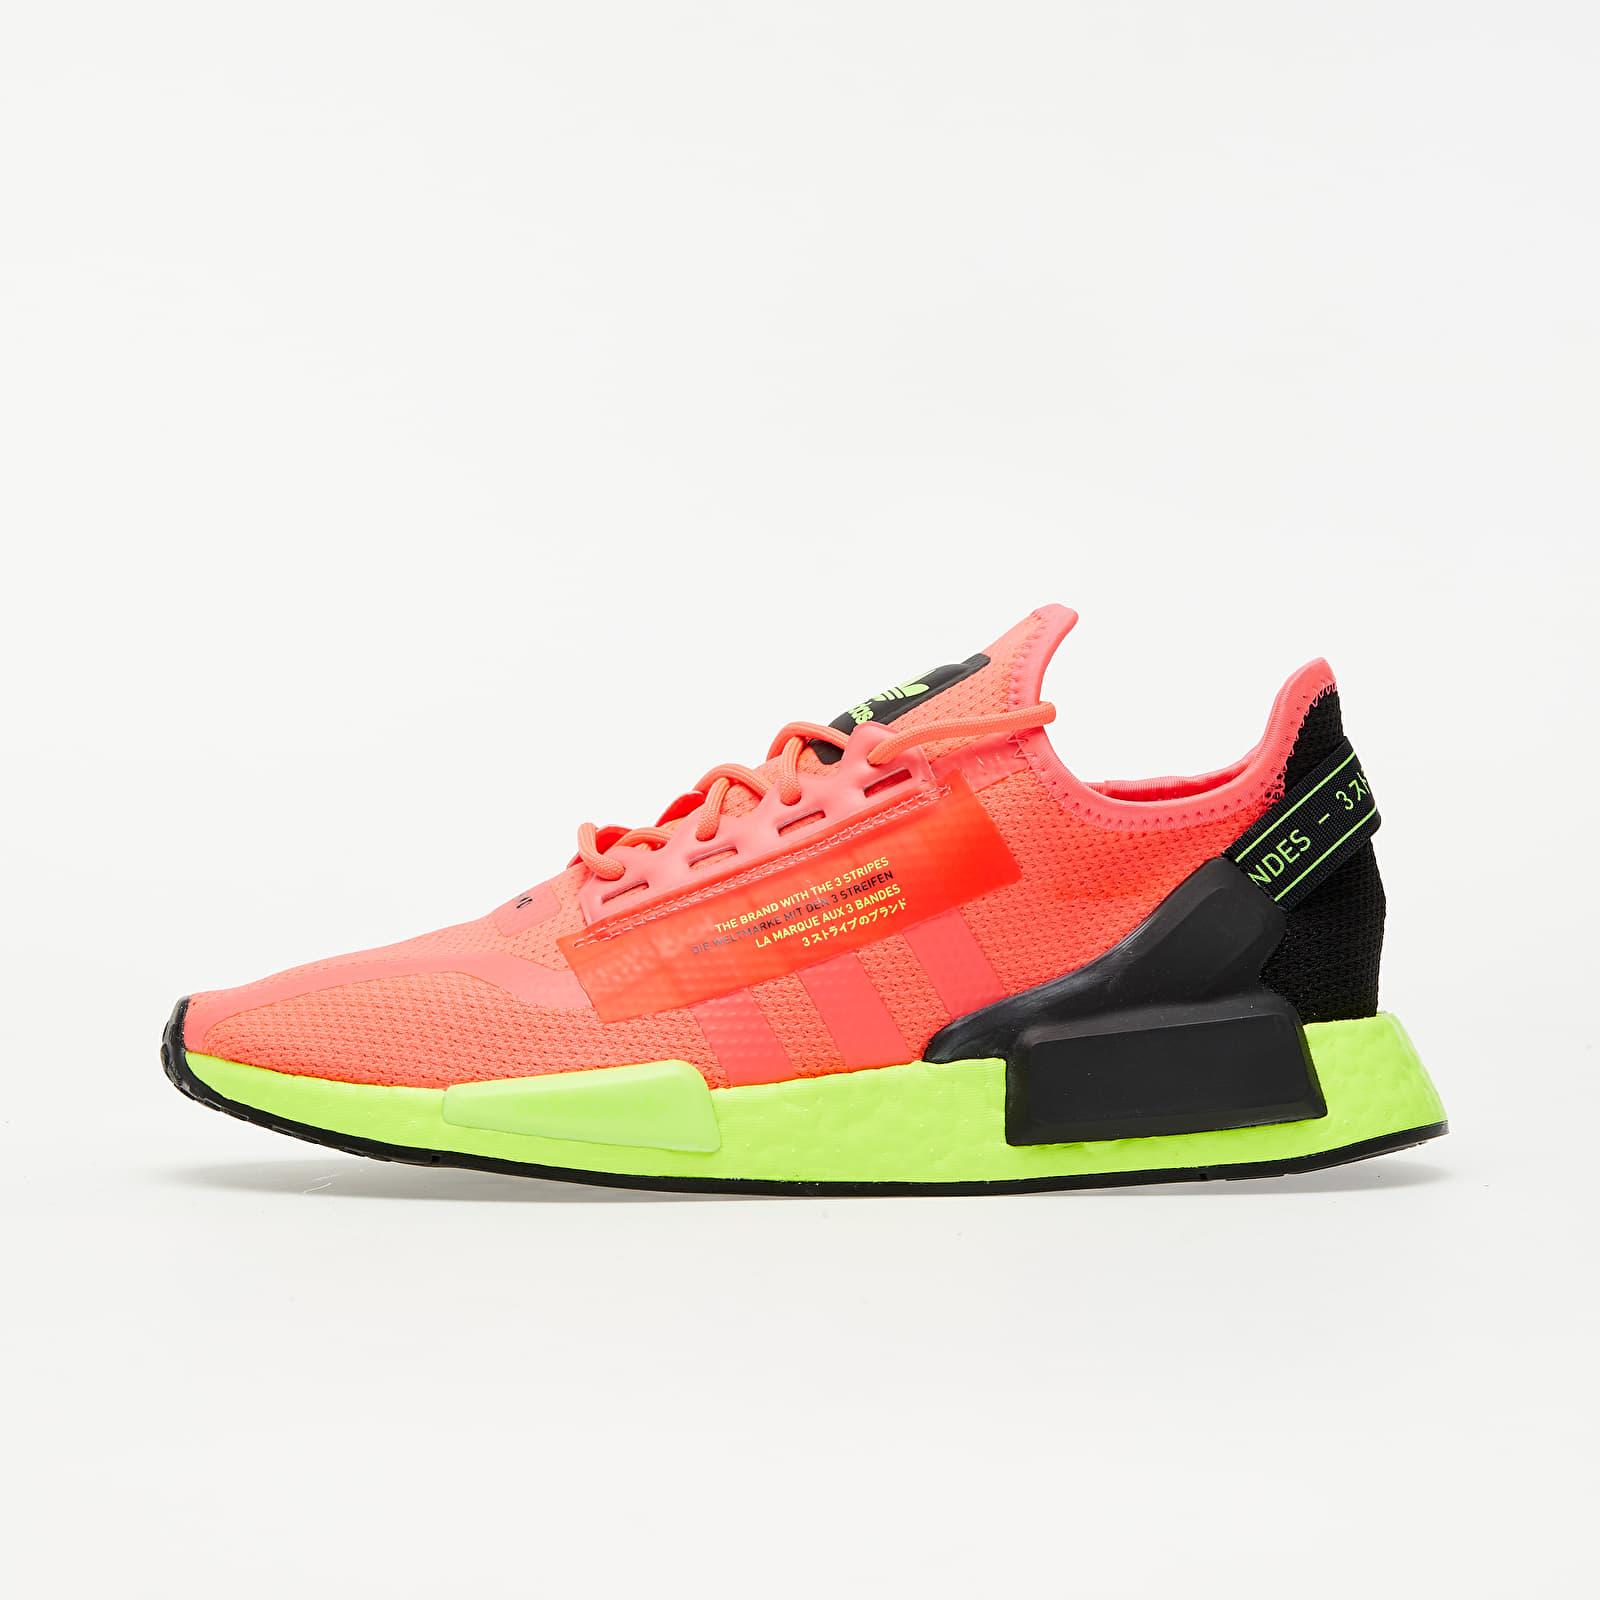 adidas NMD_R1.V2 Signature Pink/ Signature Pink/ Signature Green EUR 43 1/3